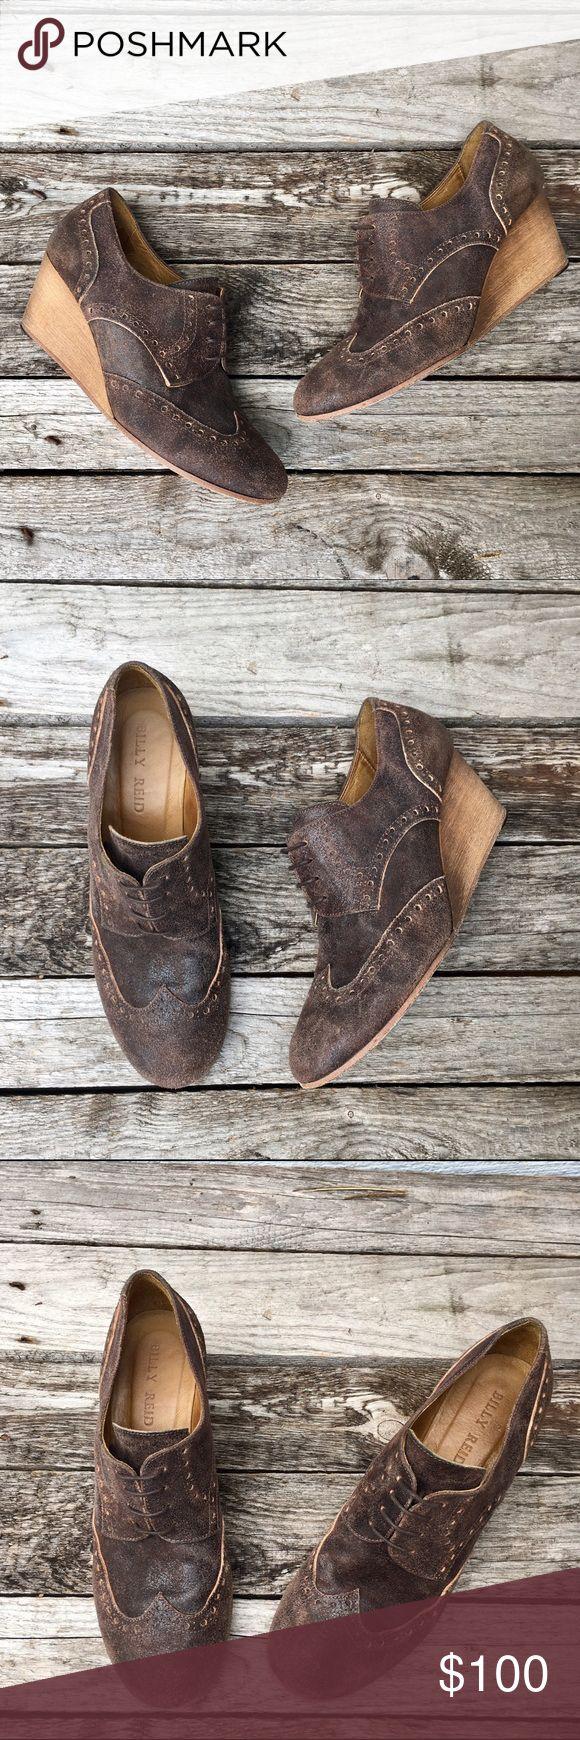 Billy Reid 'Evelyn' Brown Wedge Oxford Shoes Gentle wear, good shape. Billy Reid Shoes Wedges